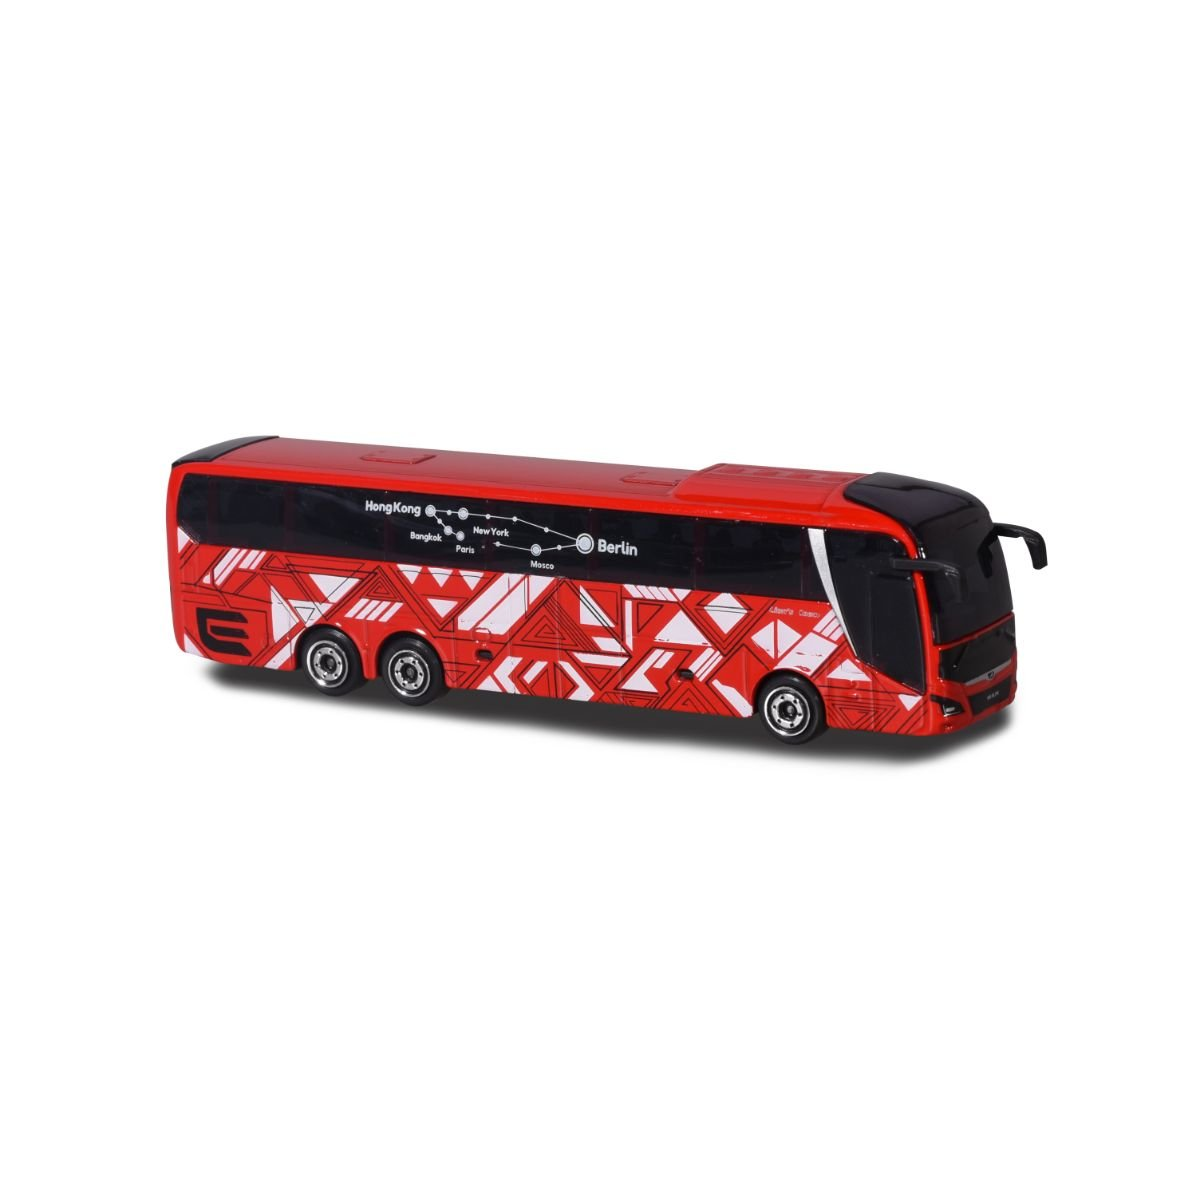 Autobuz de jucarie, Majorette, rosu